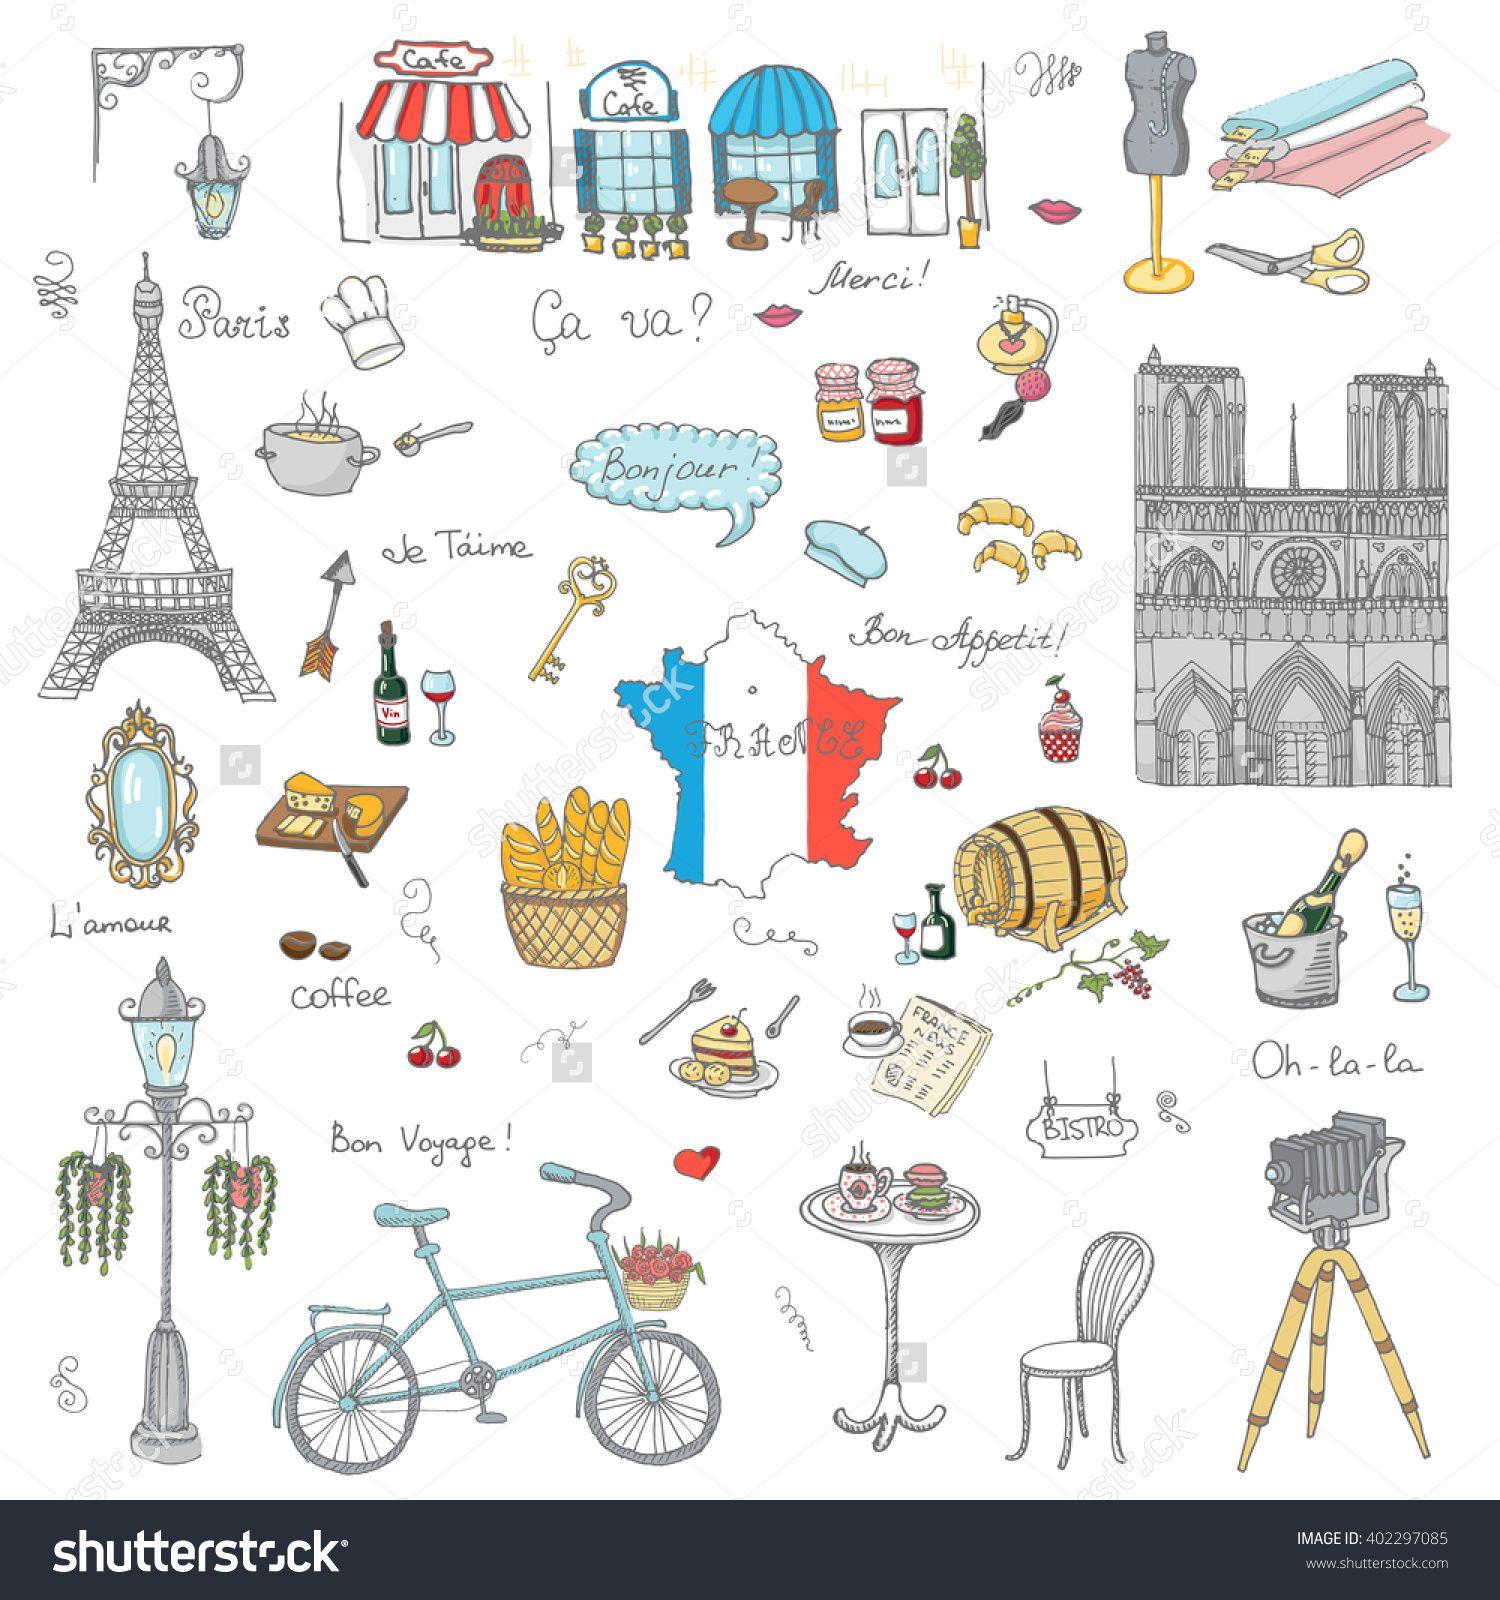 Paris Illustration: Set Of Hand Drawn French Icons, Paris Sketch Vector